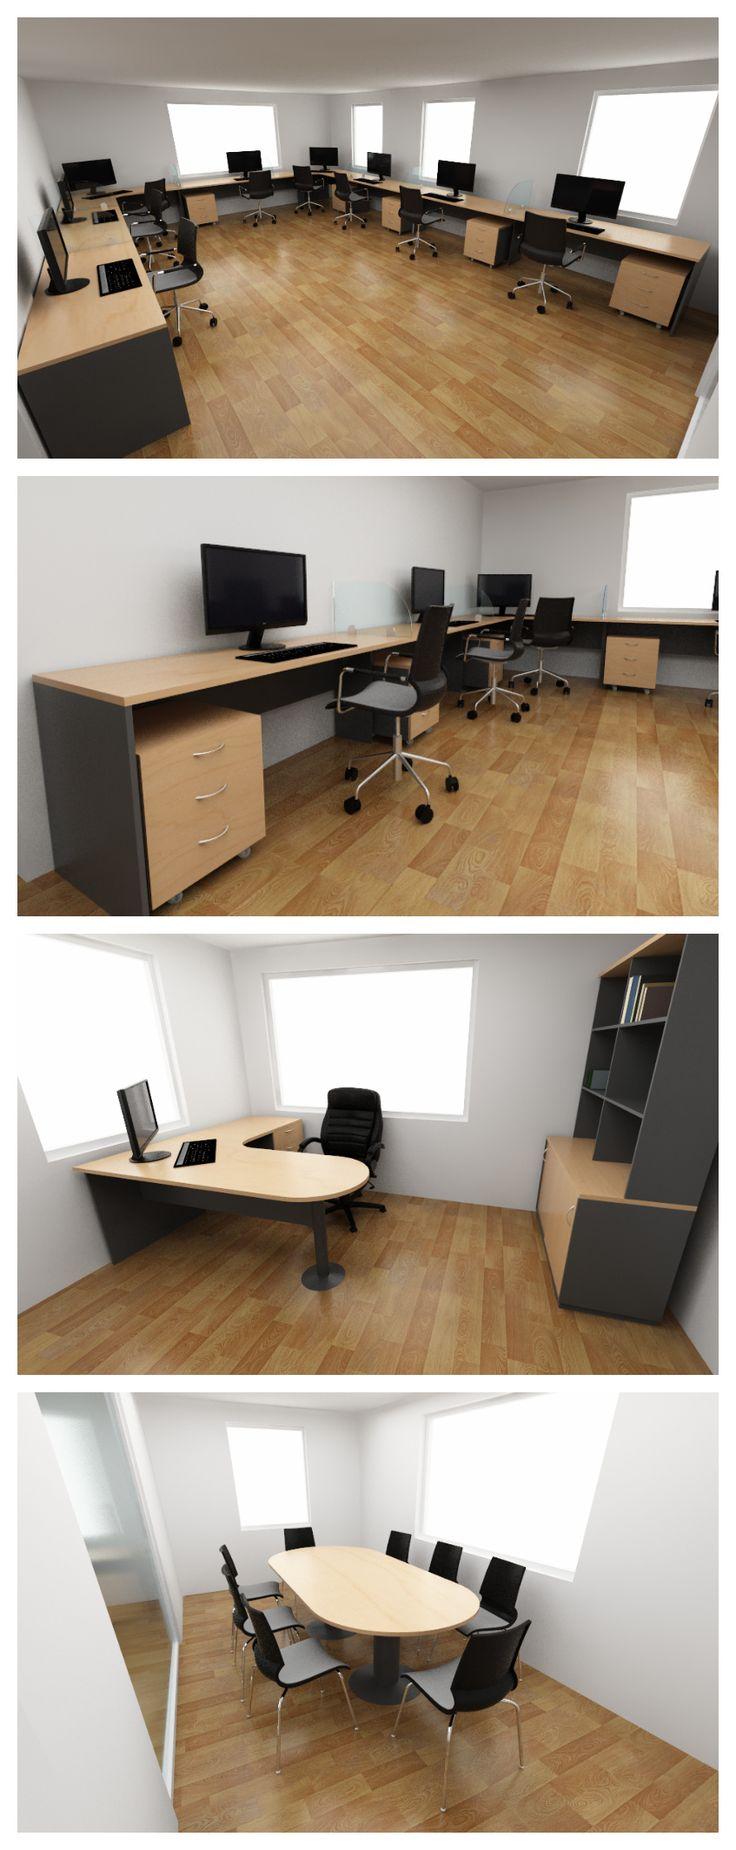 Propuesta de mobiliario para oficina que consta de for Mobilario de oficina